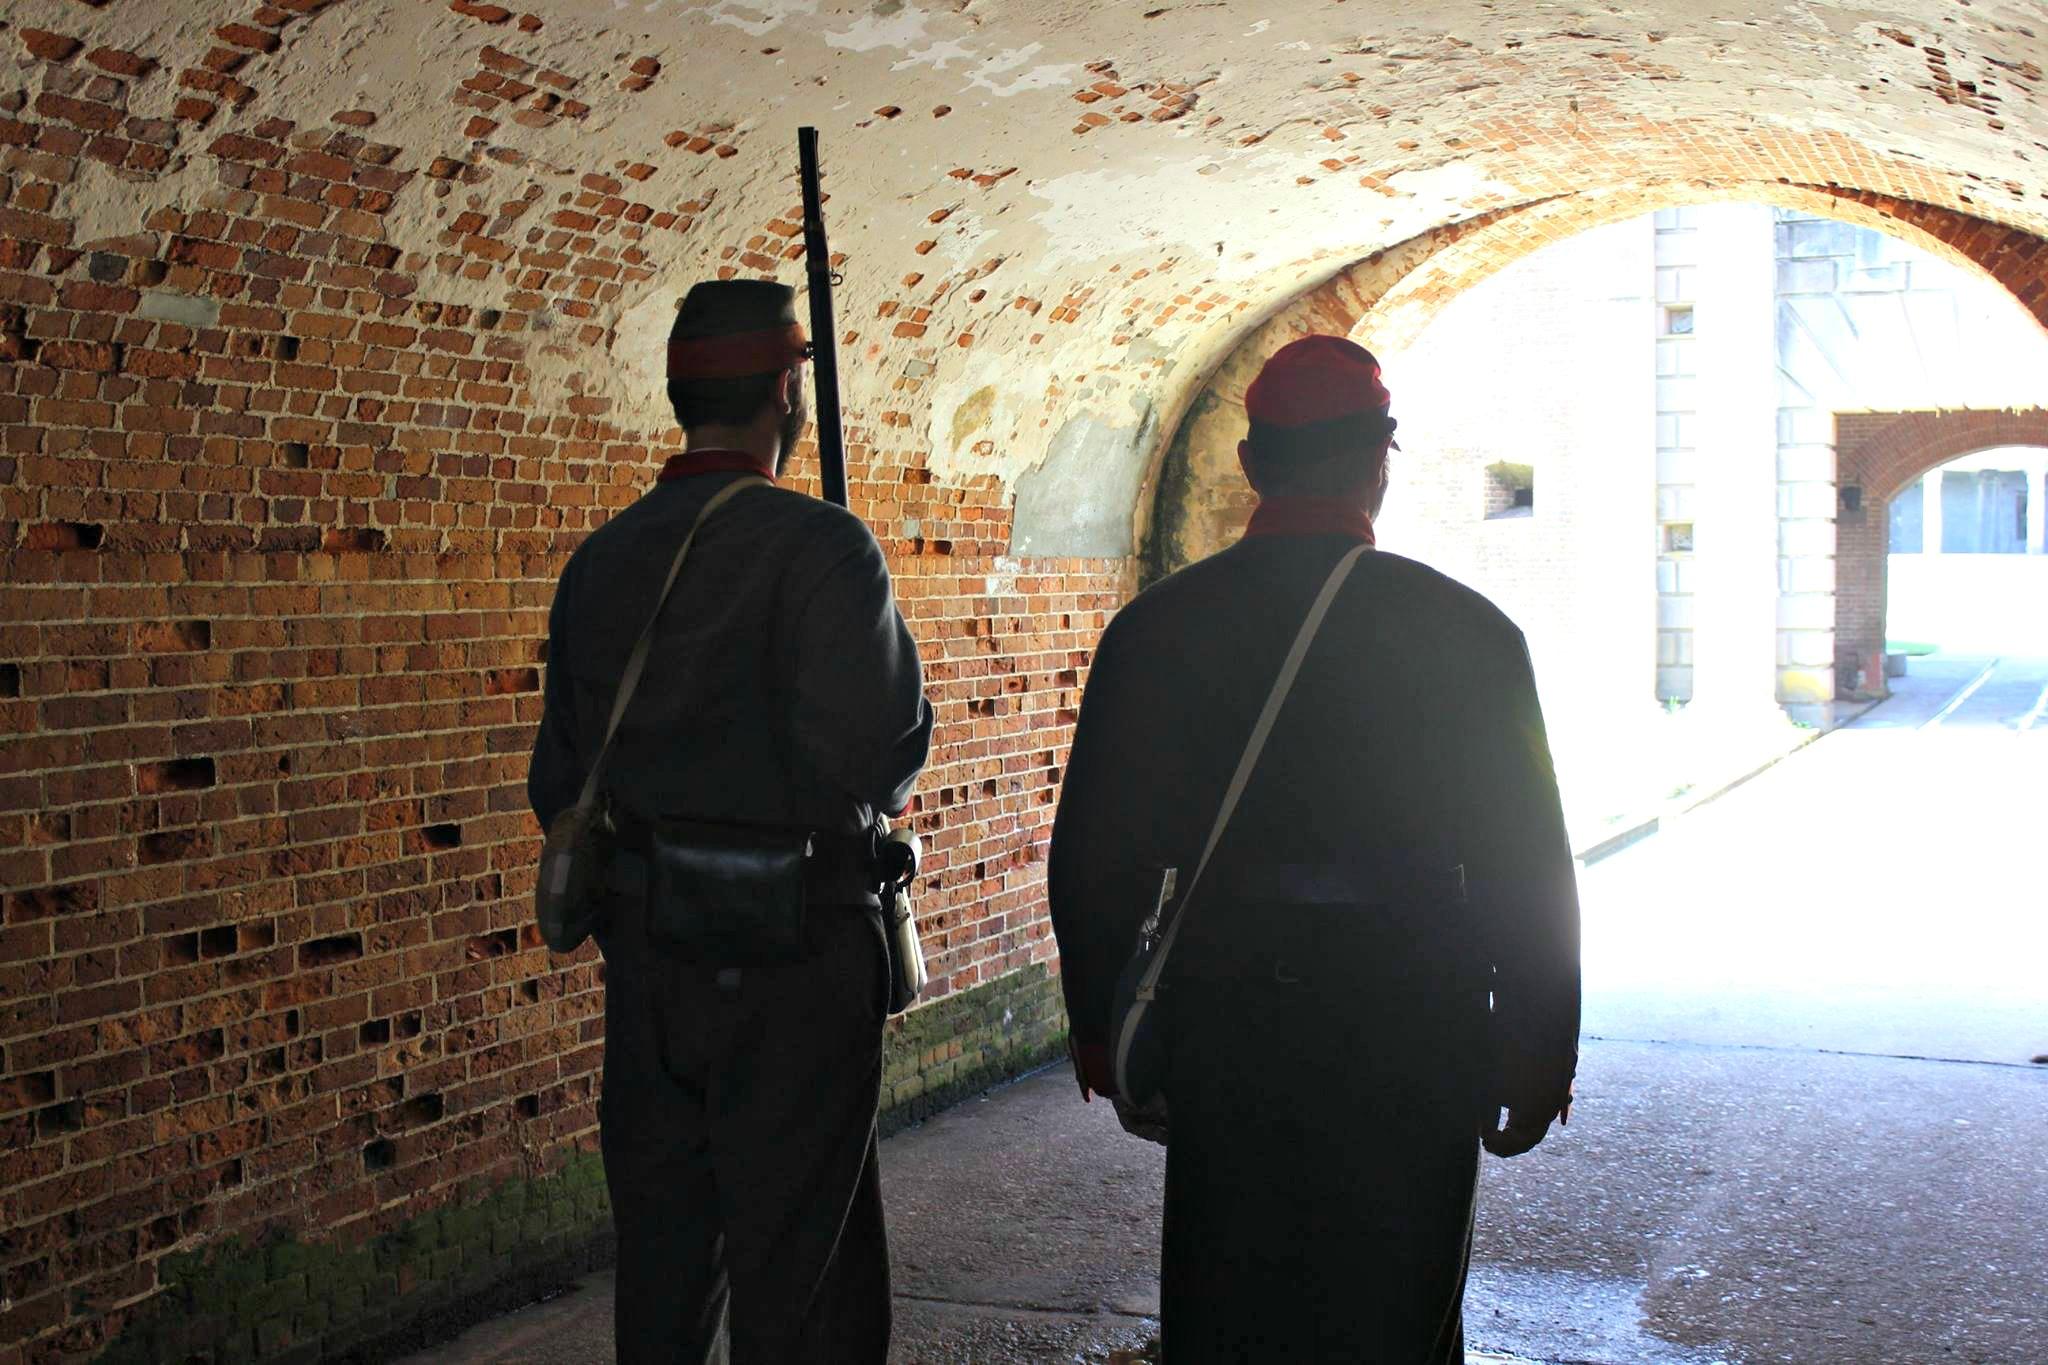 fort morgan civil war re-enactors gulf shores alabama